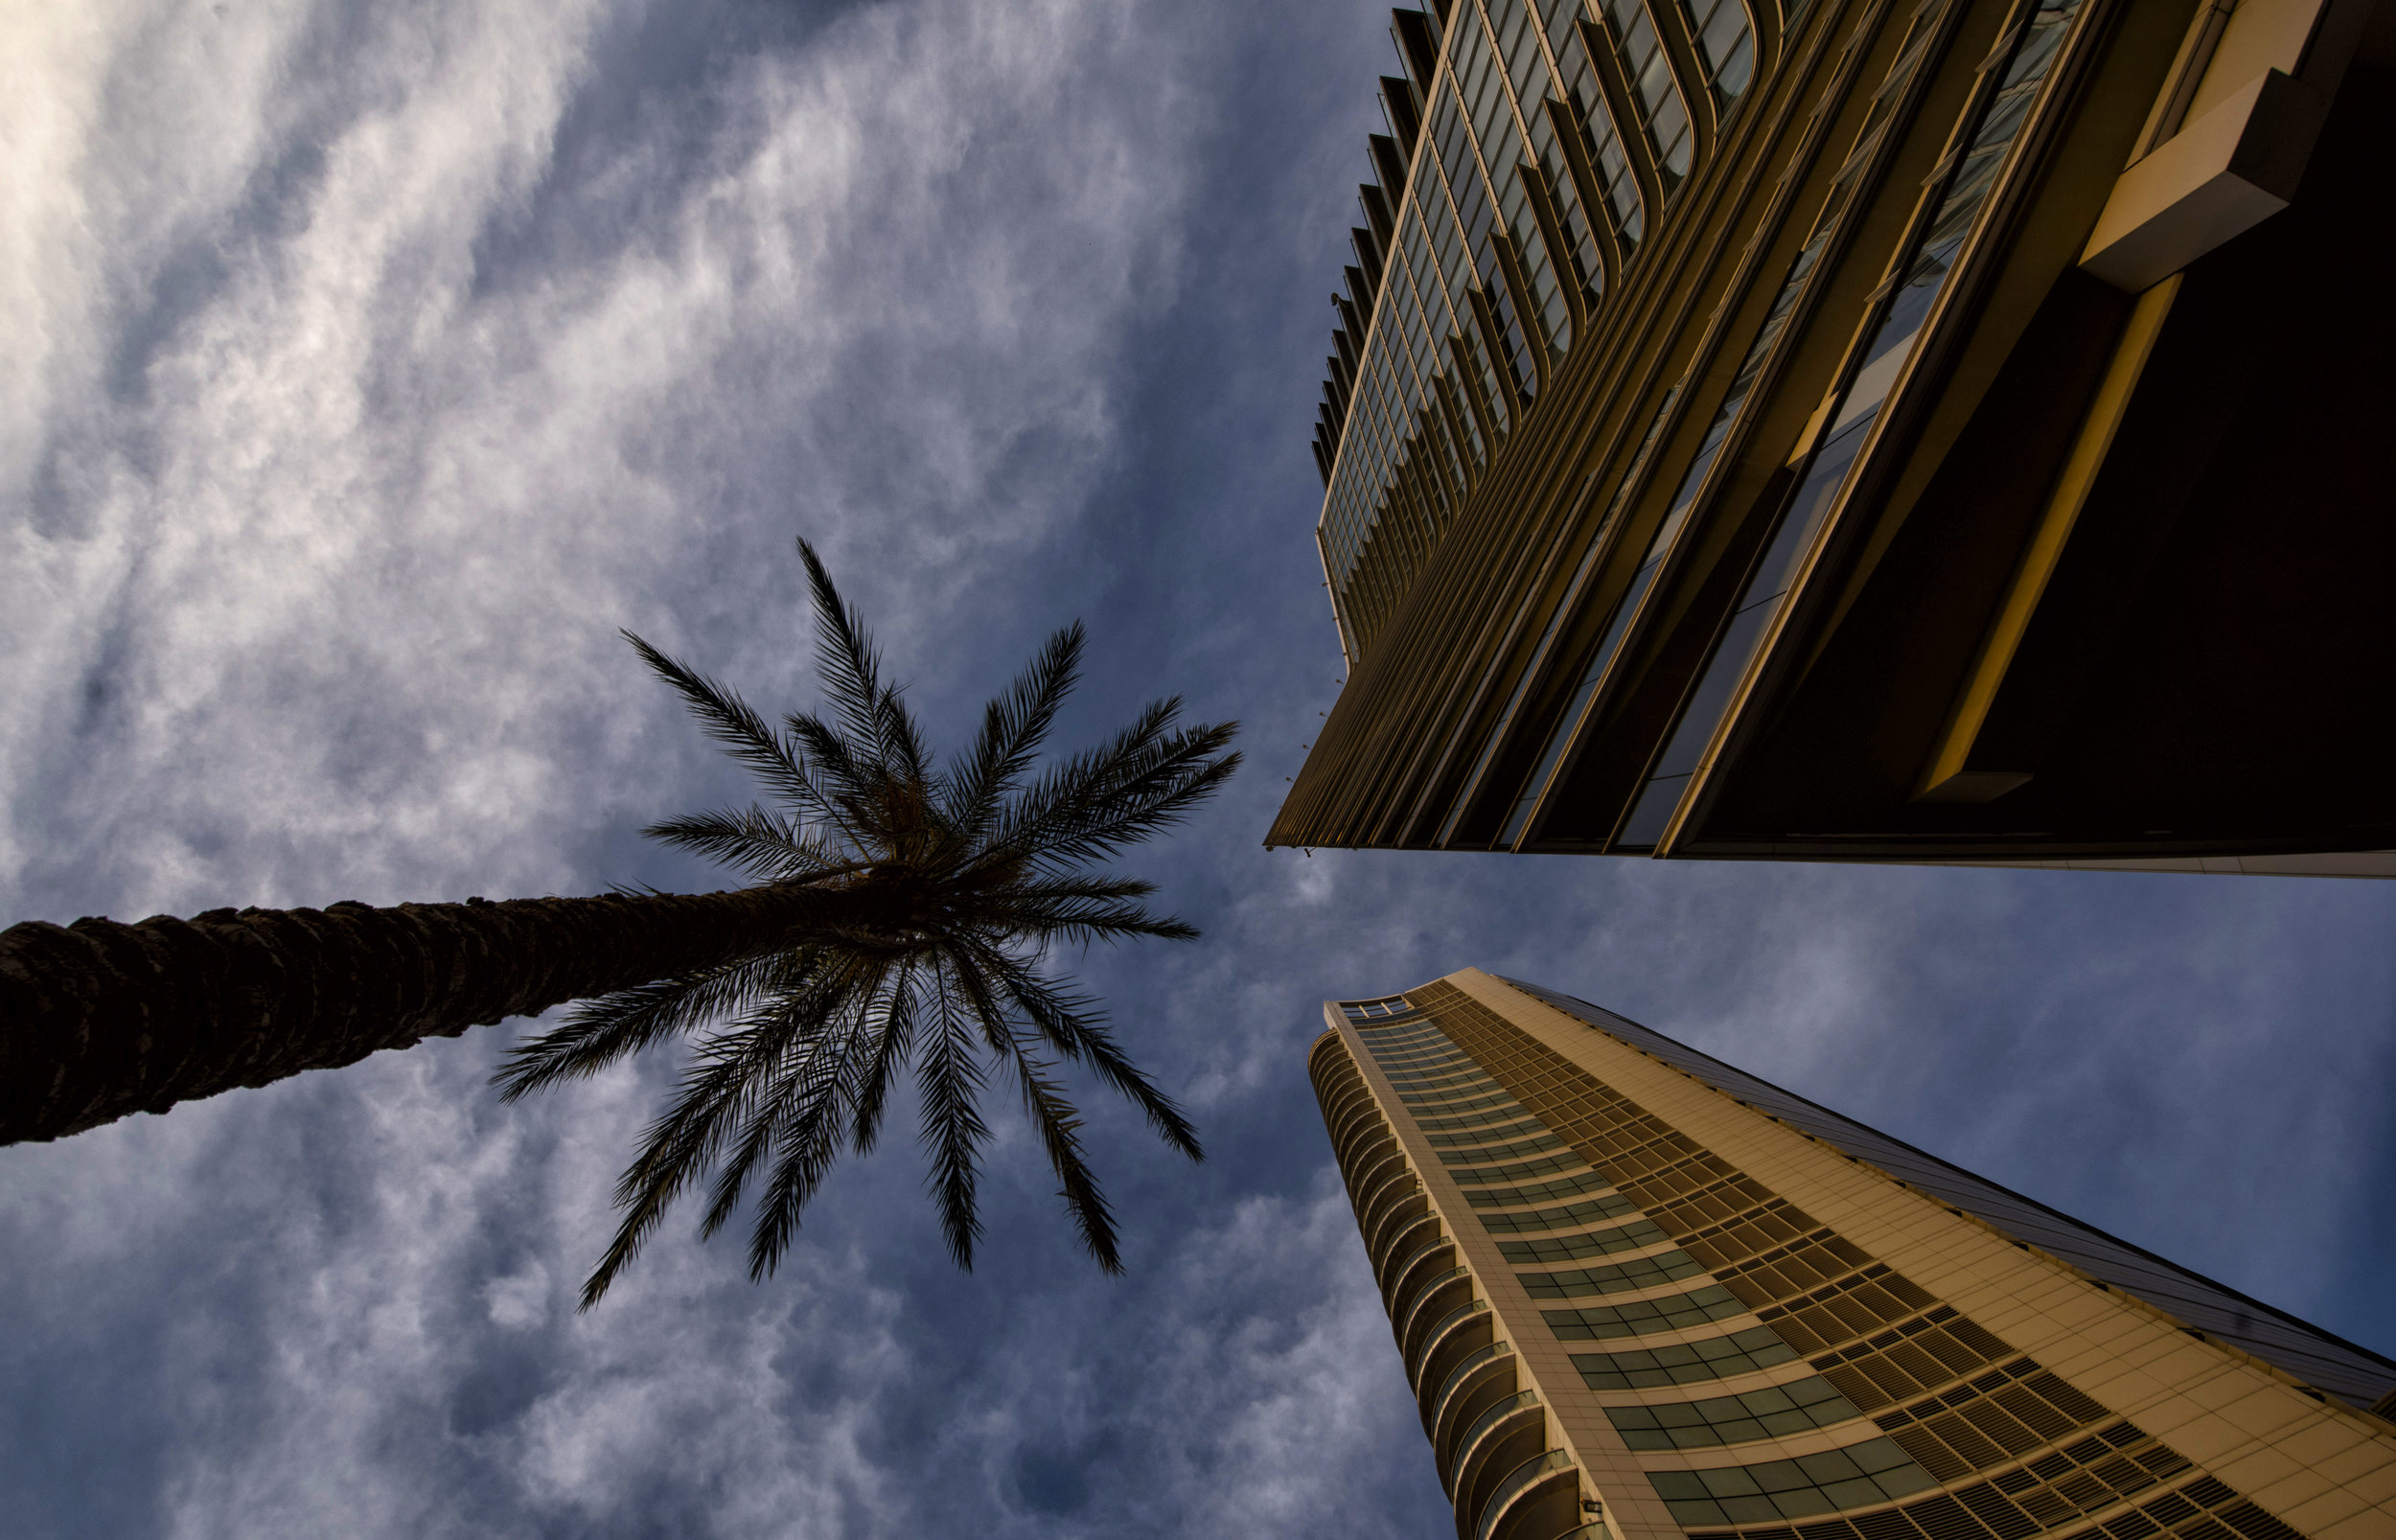 Palm Tree. Beirut, Lebanon.